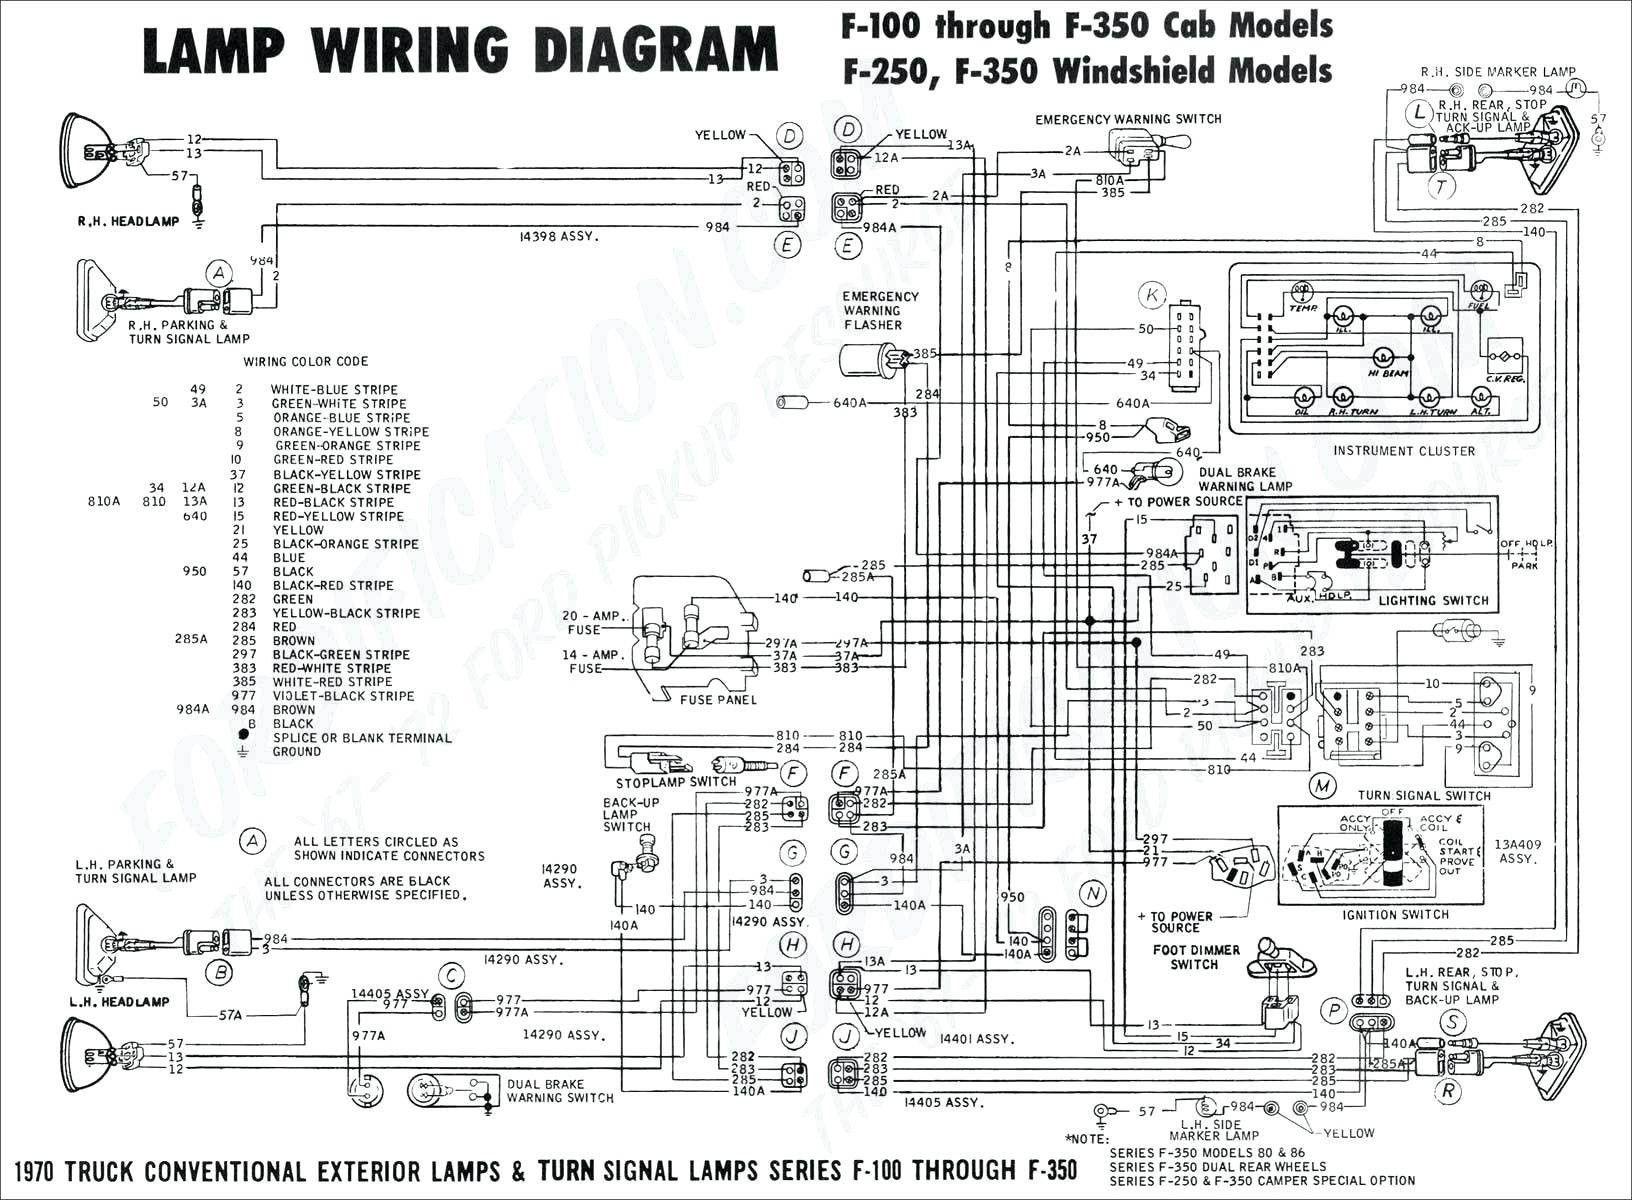 [DIAGRAM] 1965 Mustang Wiring Diagram For Lighting